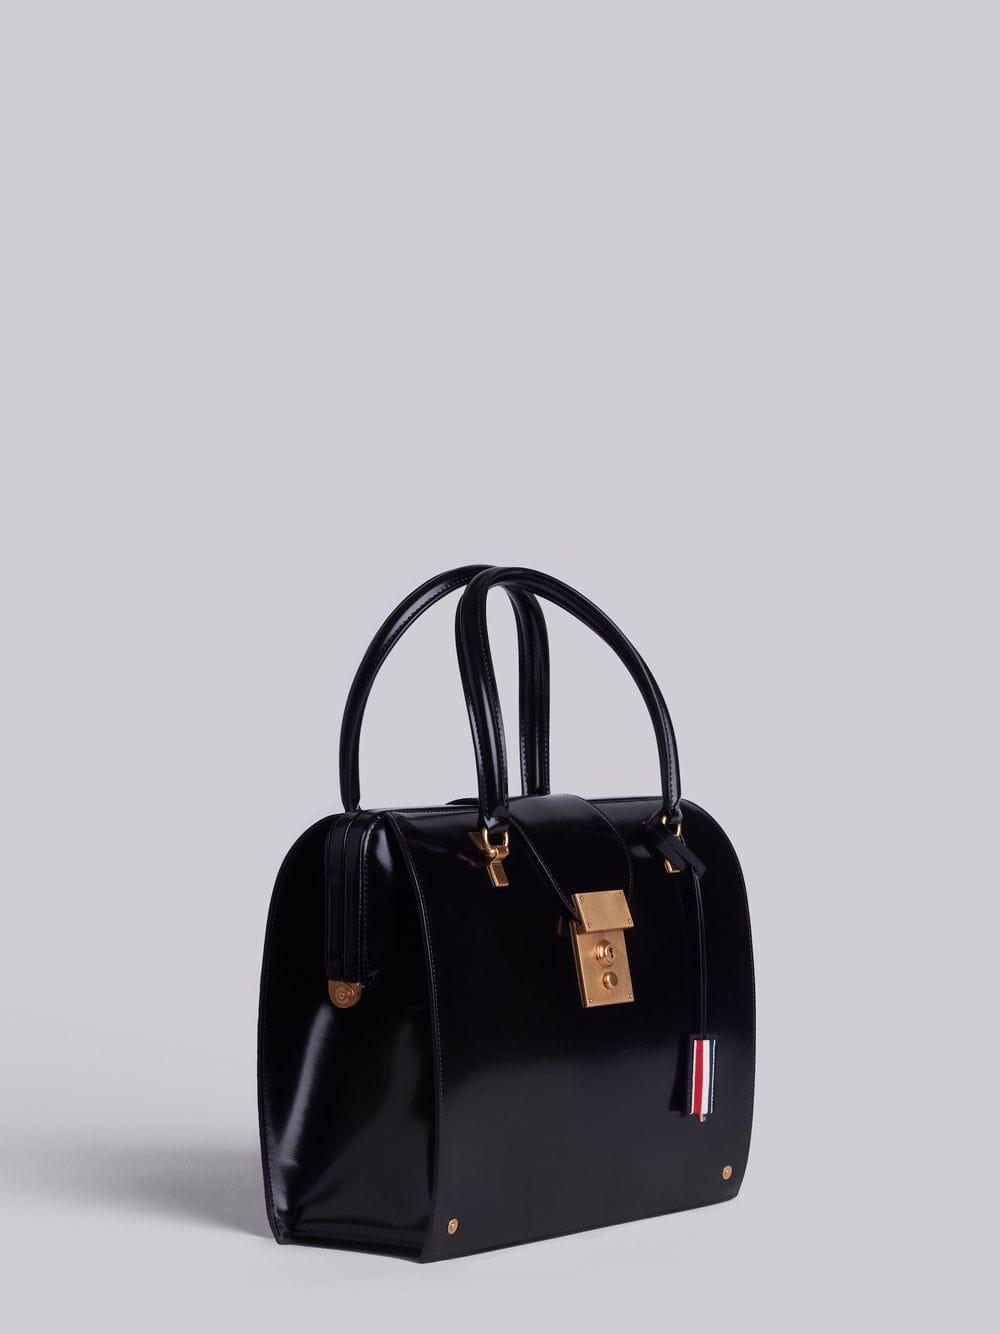 Lyst - Thom Browne Mrs. Thom Jr. Calfskin Bag in Black 5ced87958bb97